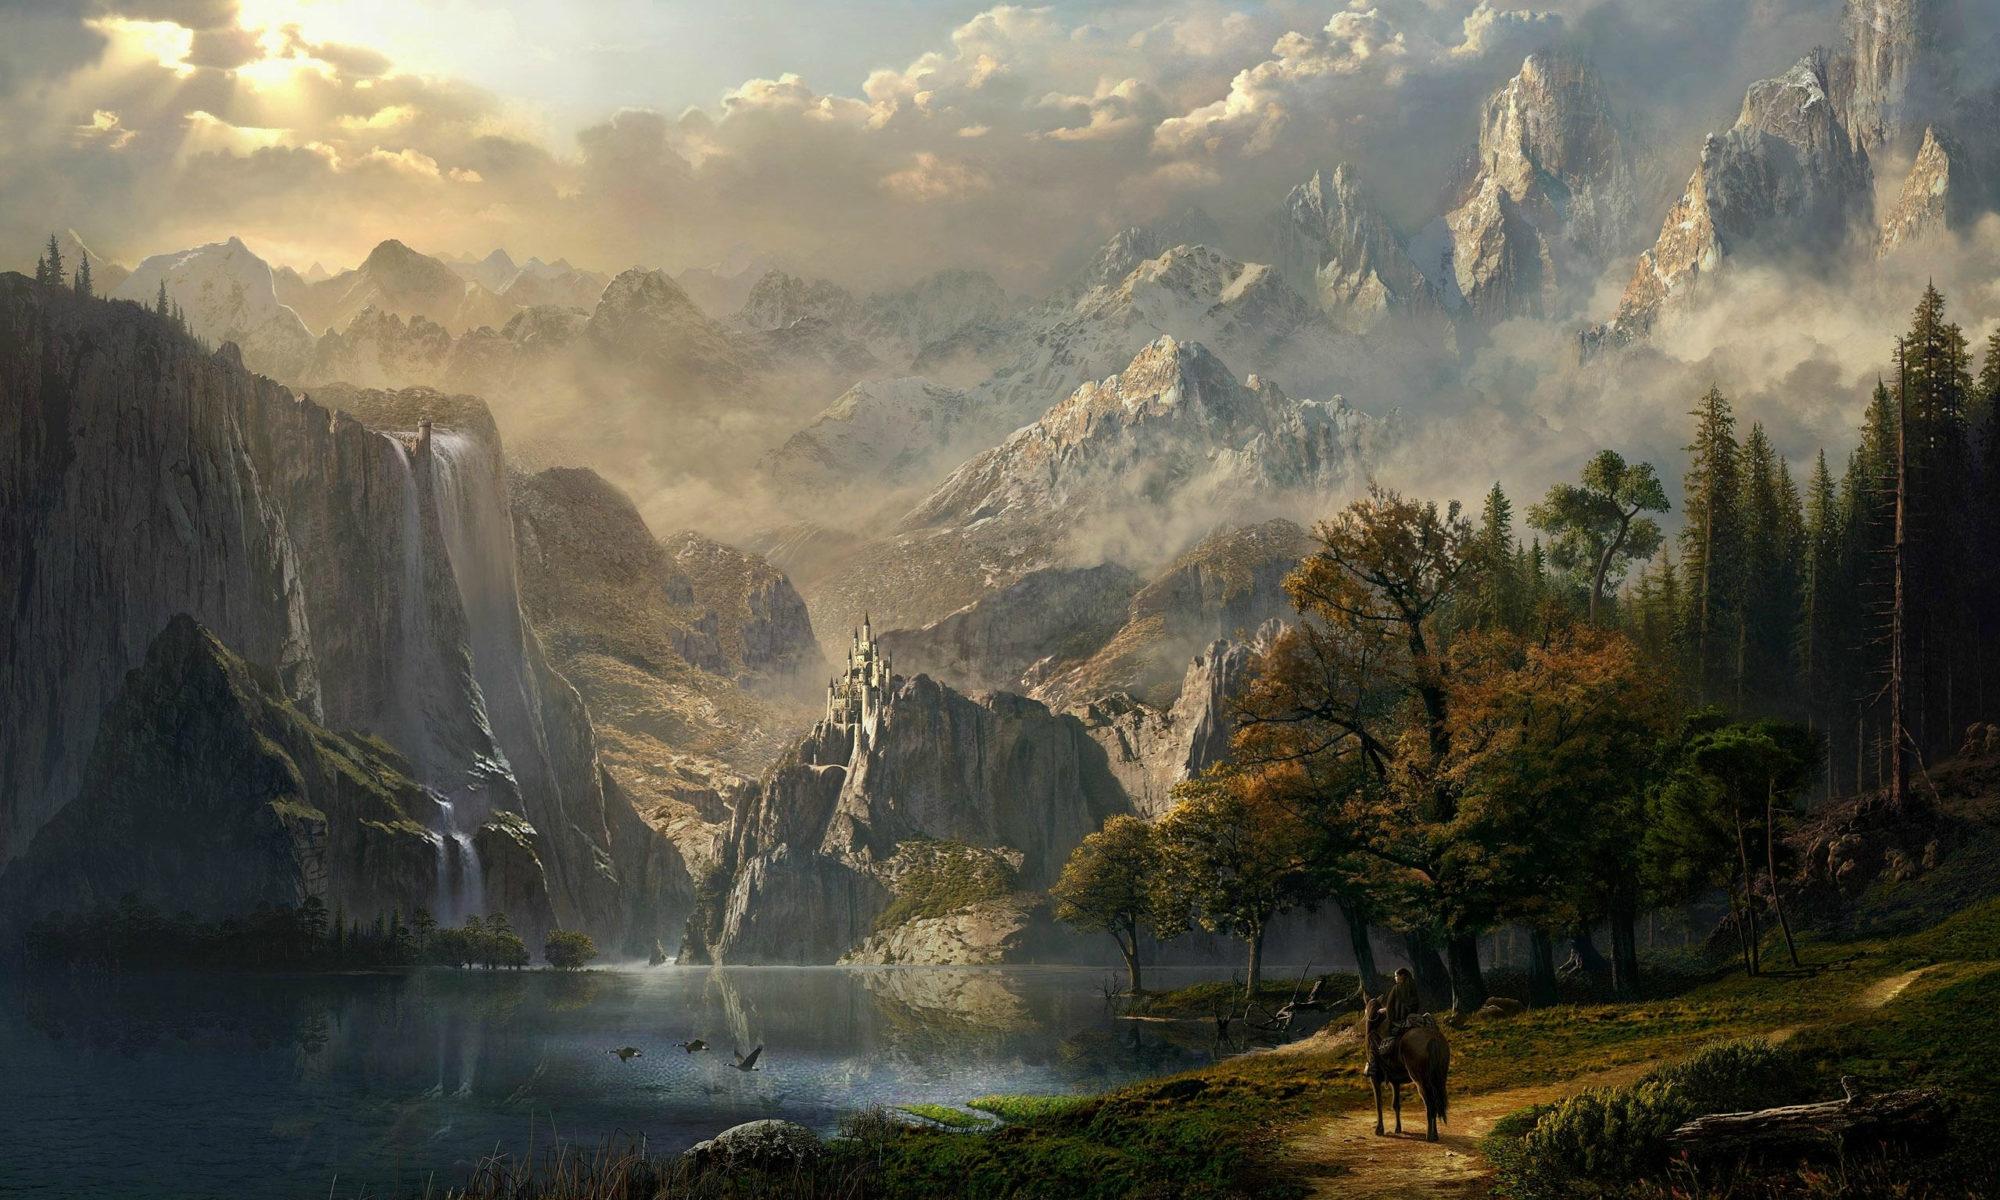 The ORPHANS of ELWYNOR